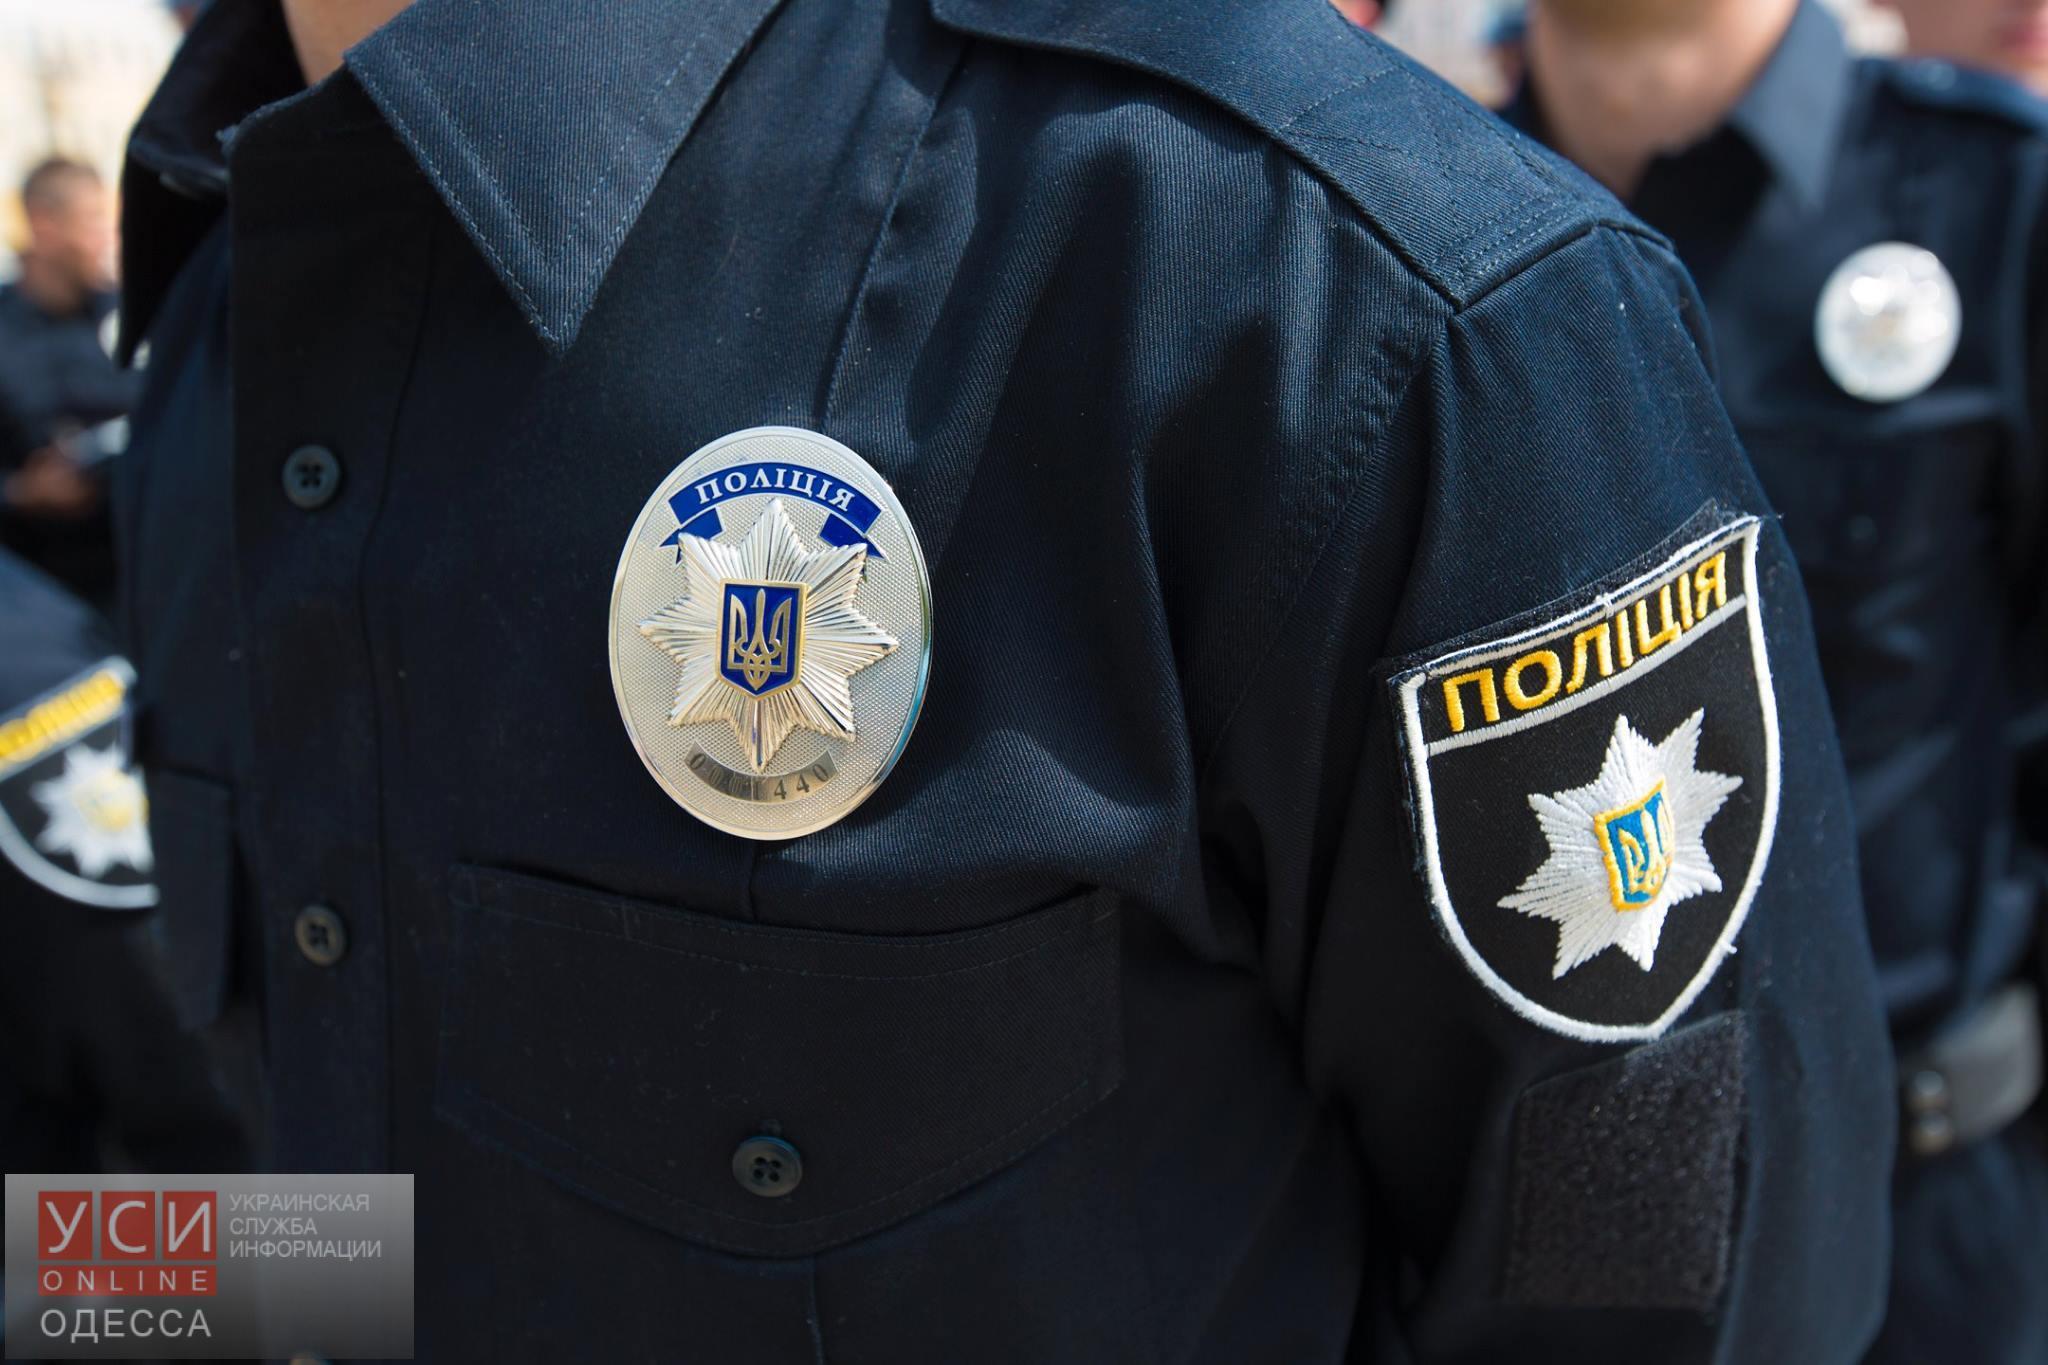 ВОдесской области пропал 56-летний мужчина